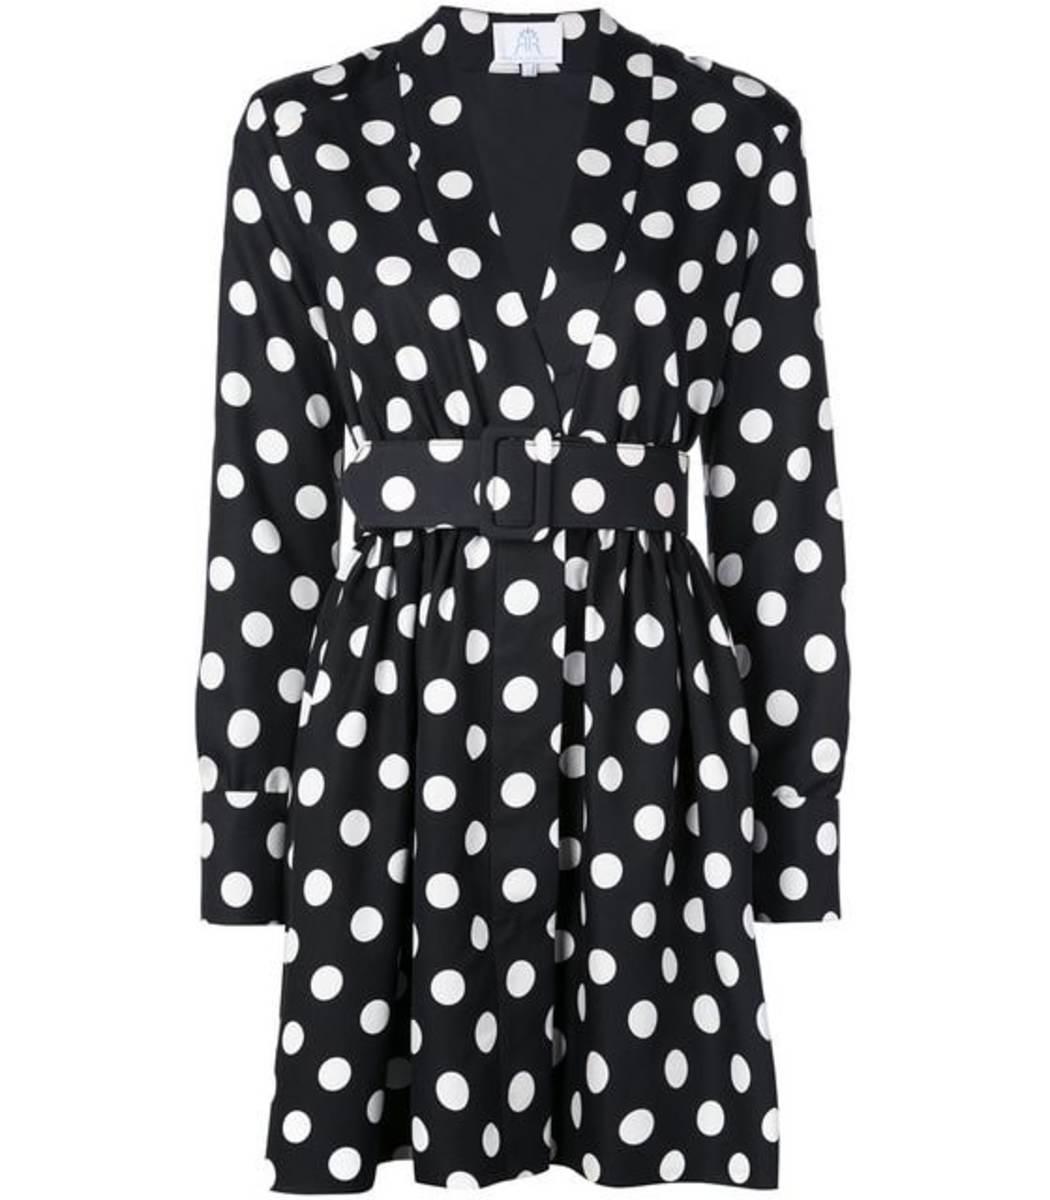 Rebecca De Ravenel Field Mini Polka Dot Dress